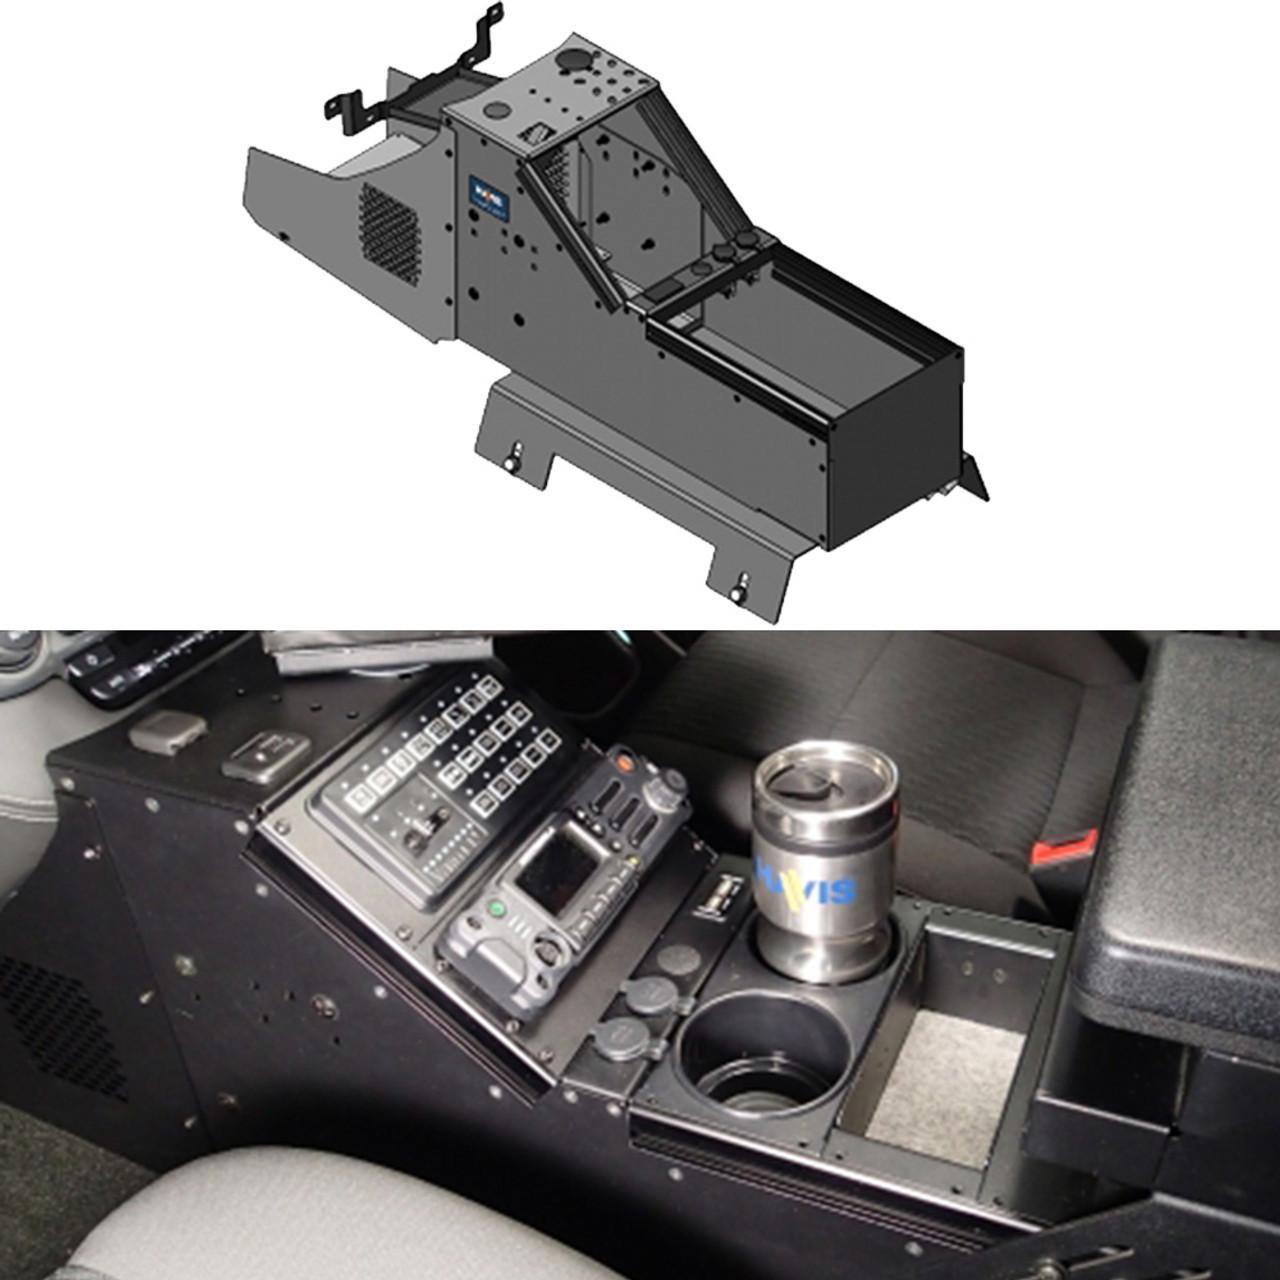 havis c vs 0812 tah 1 20 inch vehicle specific console for [ 1000 x 1000 Pixel ]